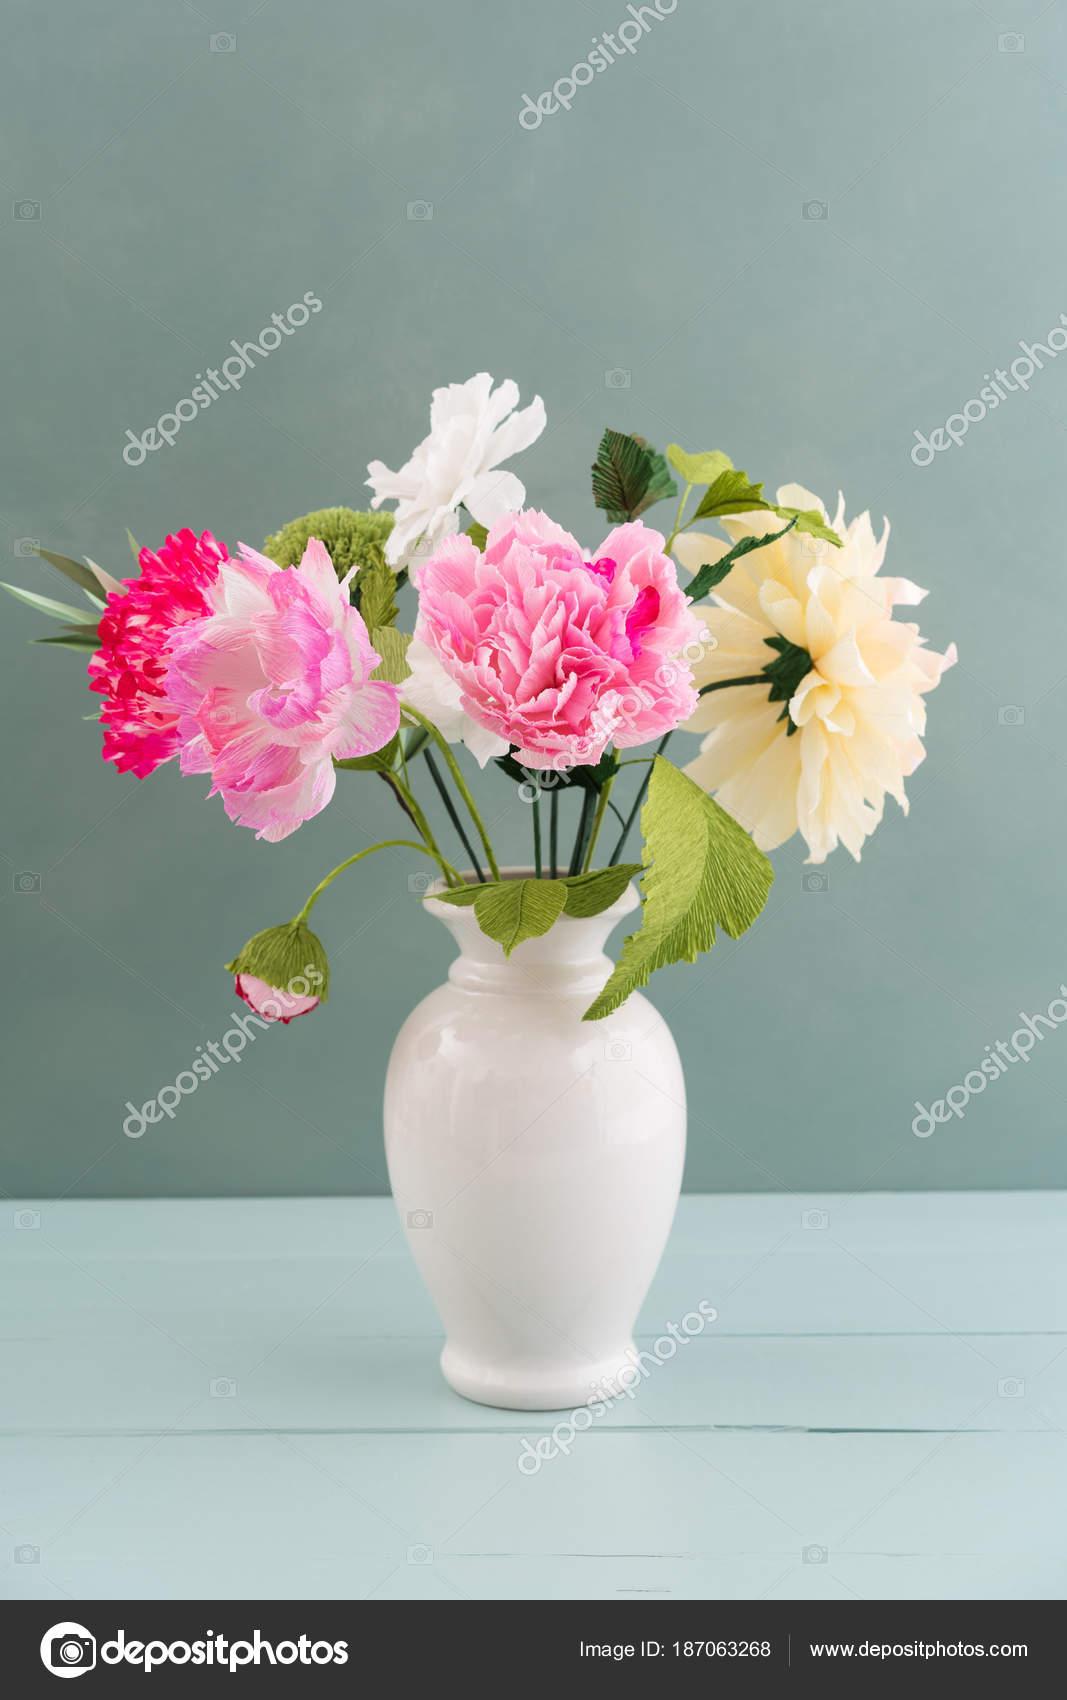 Crepe paper flower bouquet — Stock Photo © ECoelfen #187063268